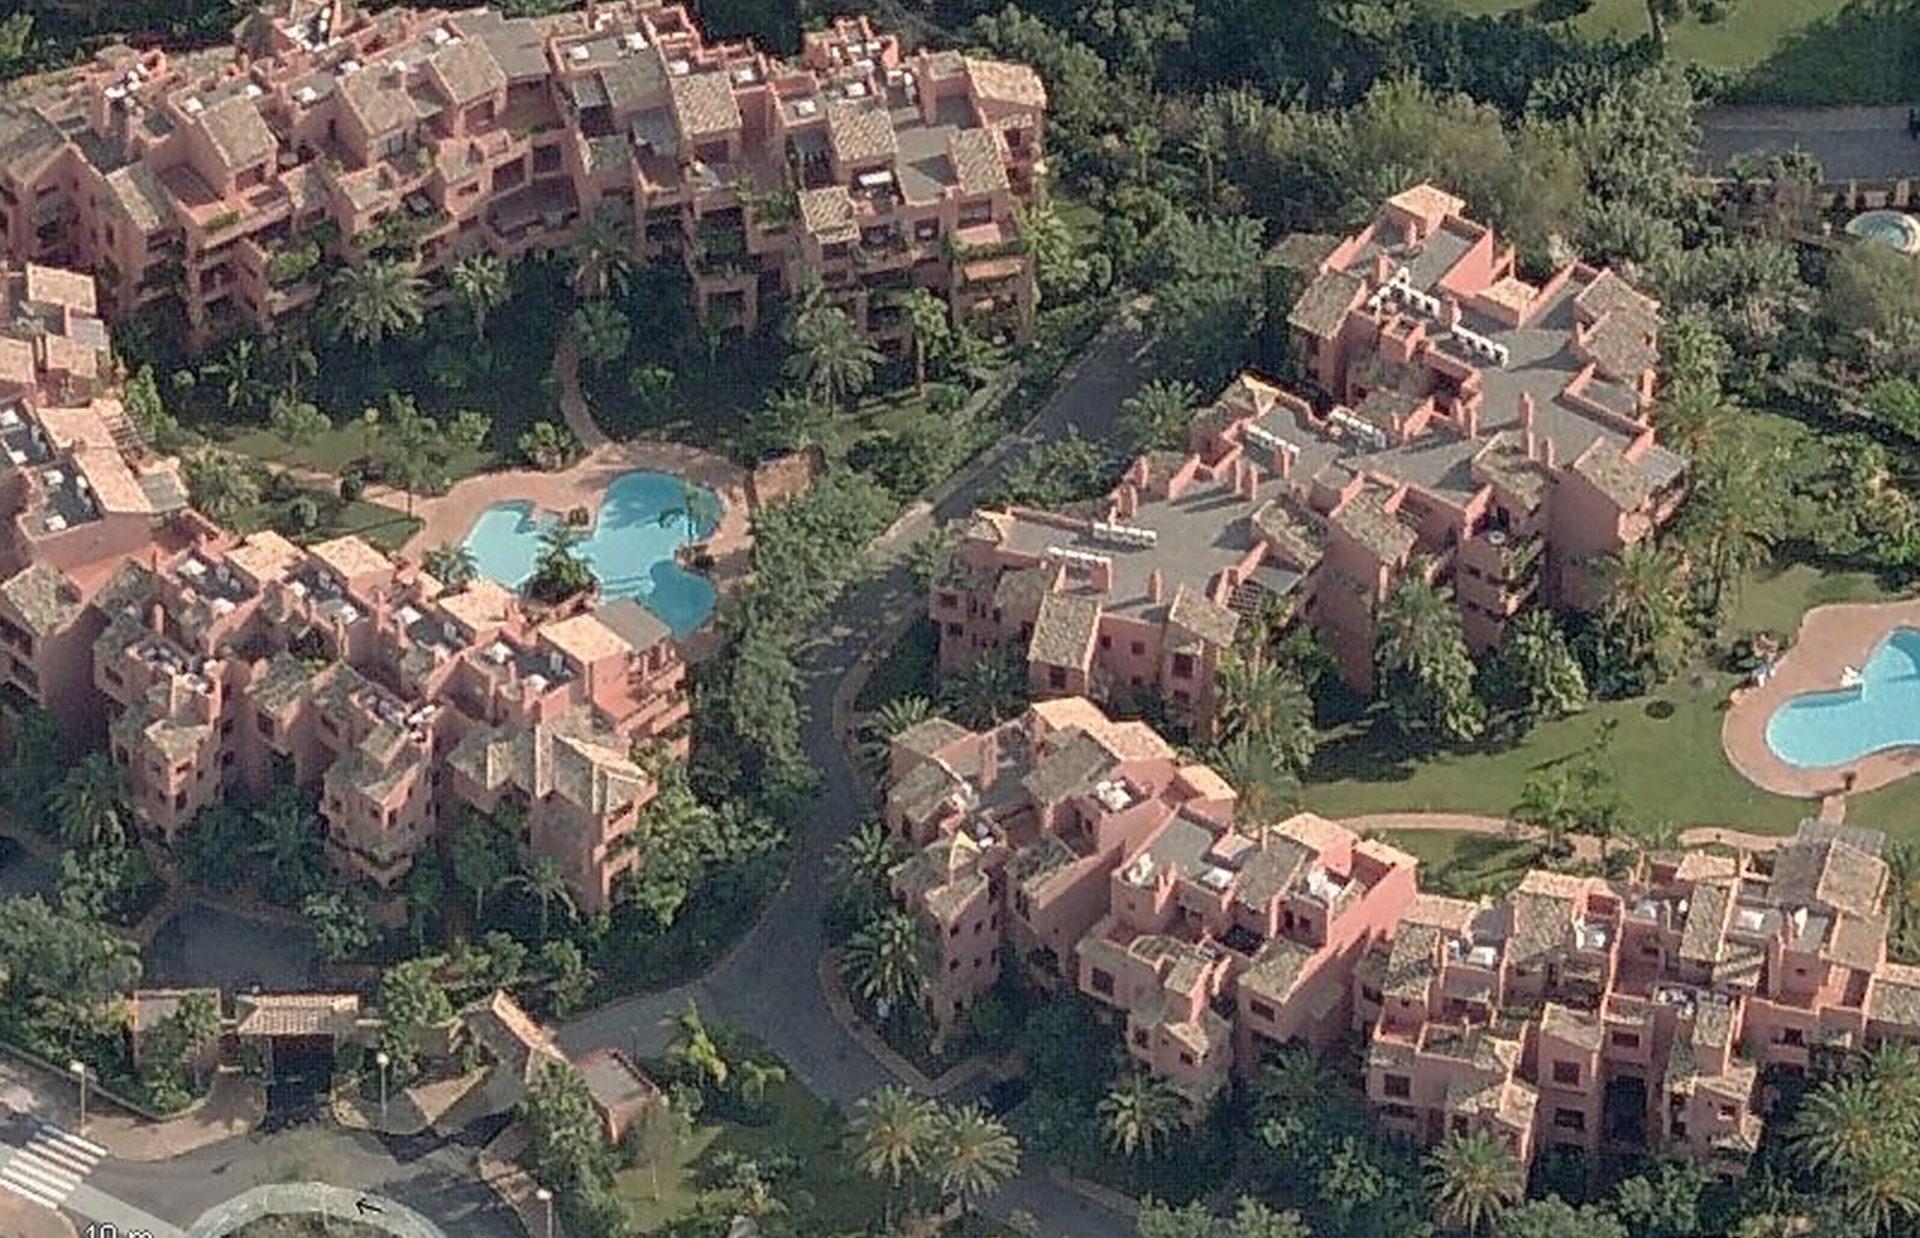 Paisajismo Urbanización Alicate, Marbella